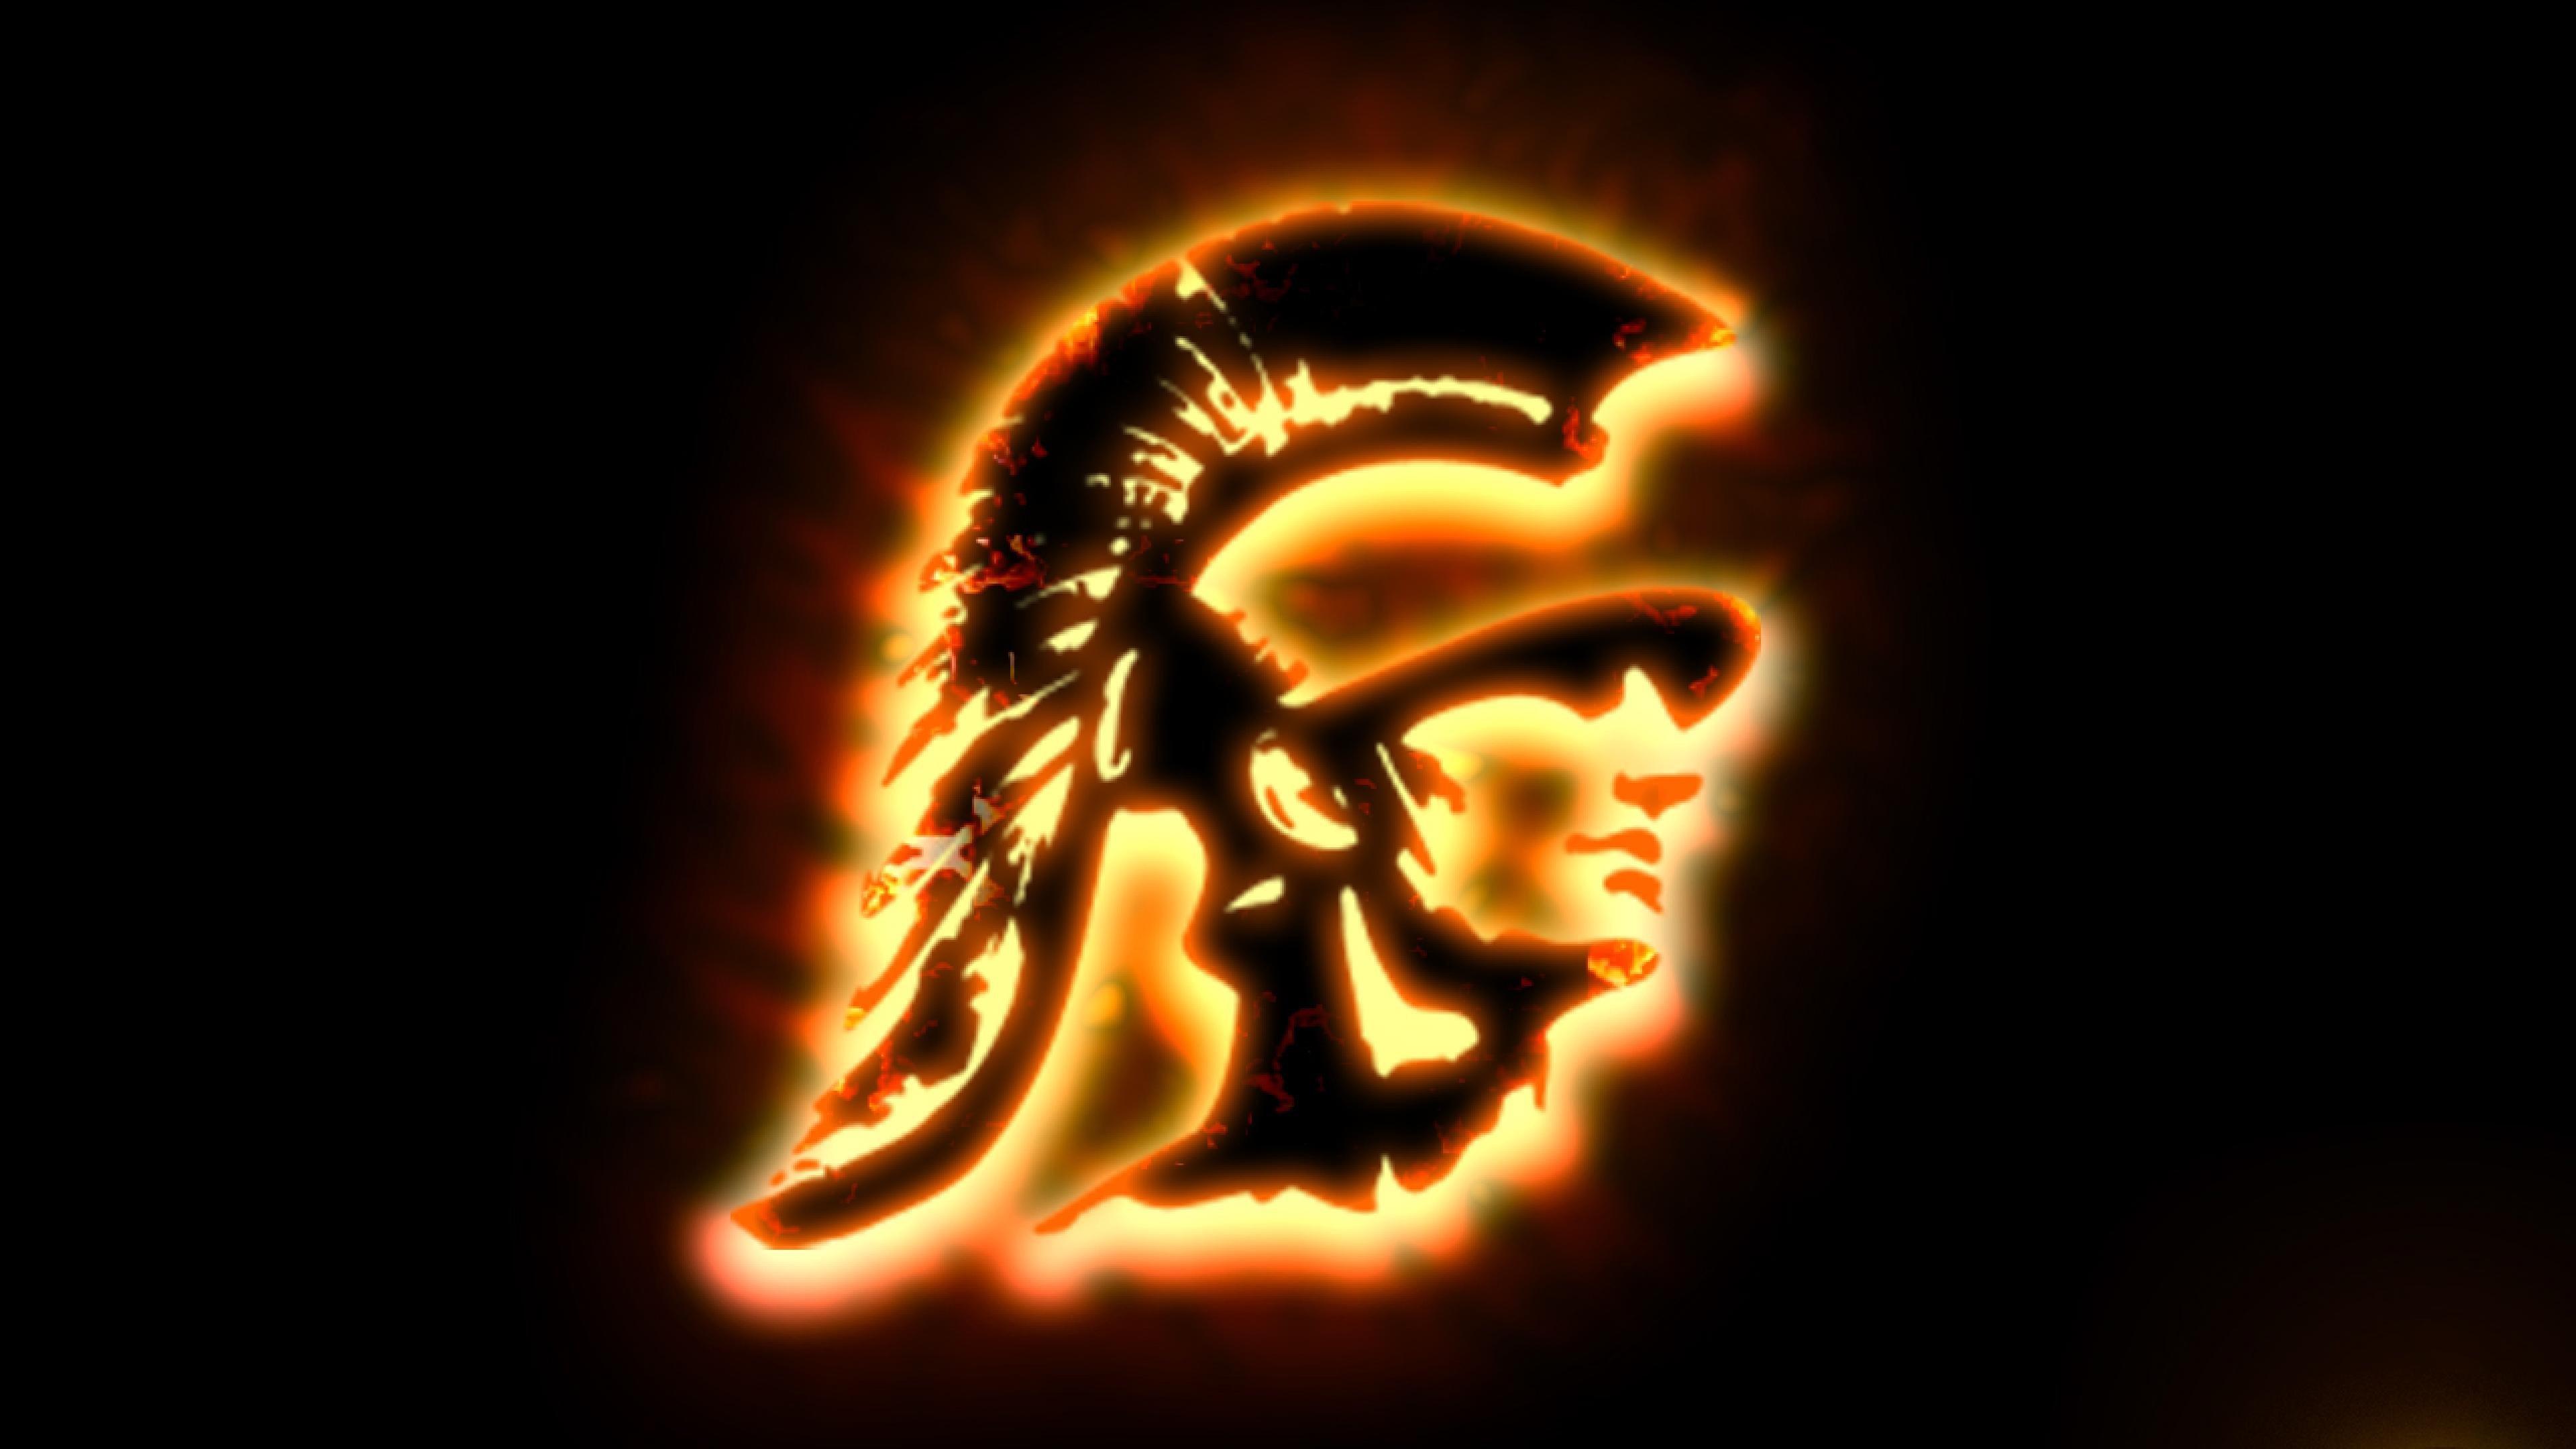 Usc Trojans Football Logo Image 3840x2160